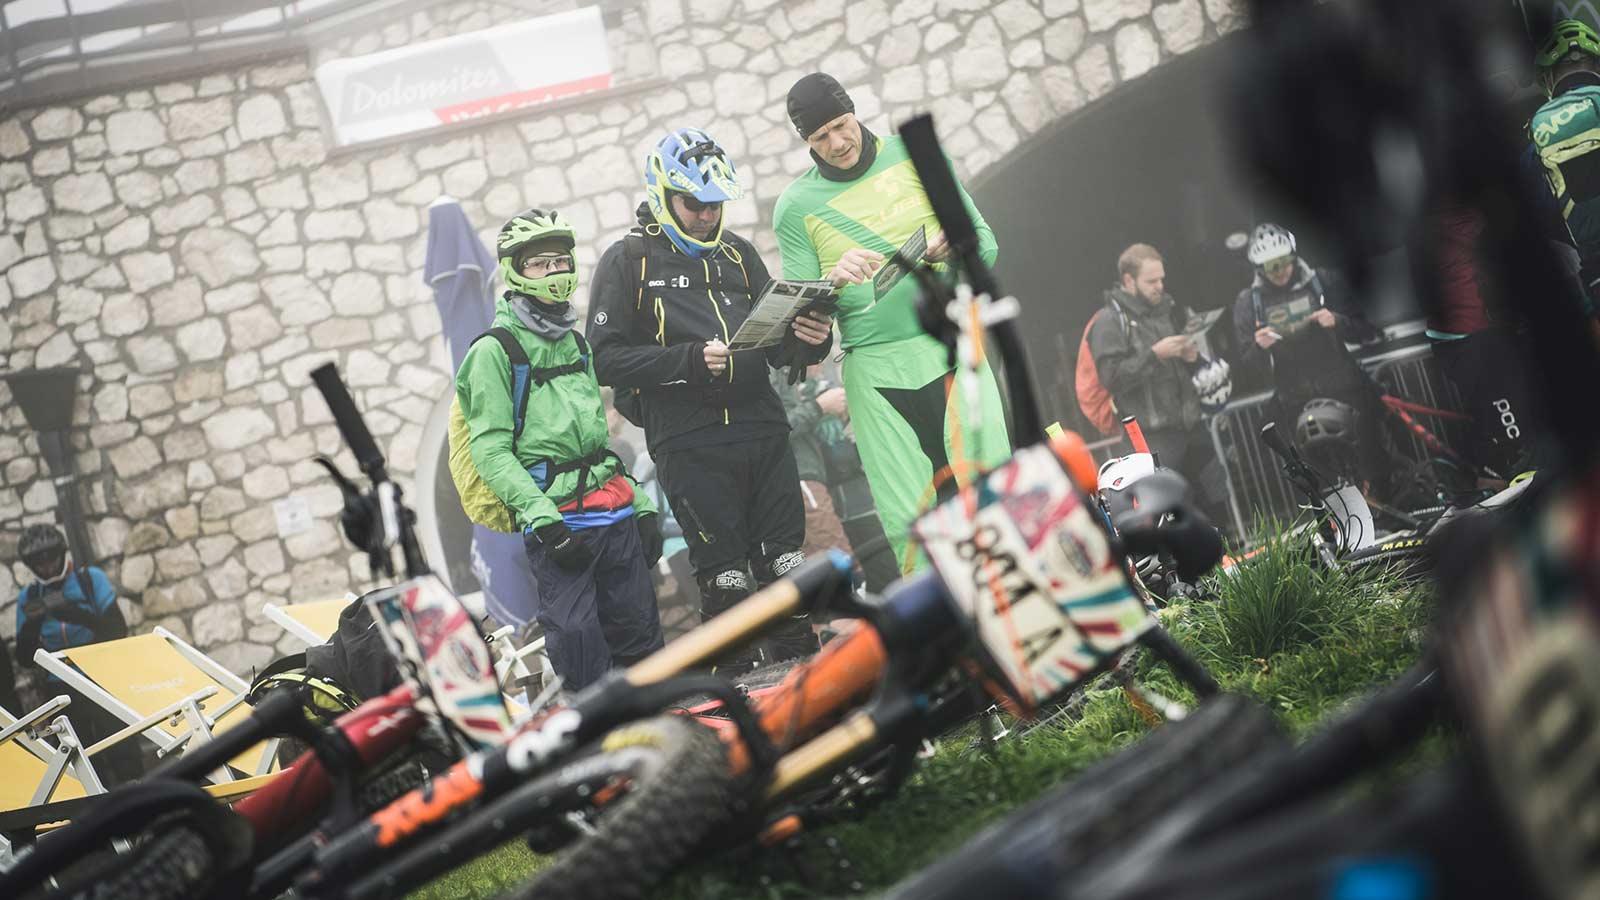 Die Rasenmäher Event Knödeljagd 2019 - Startareal